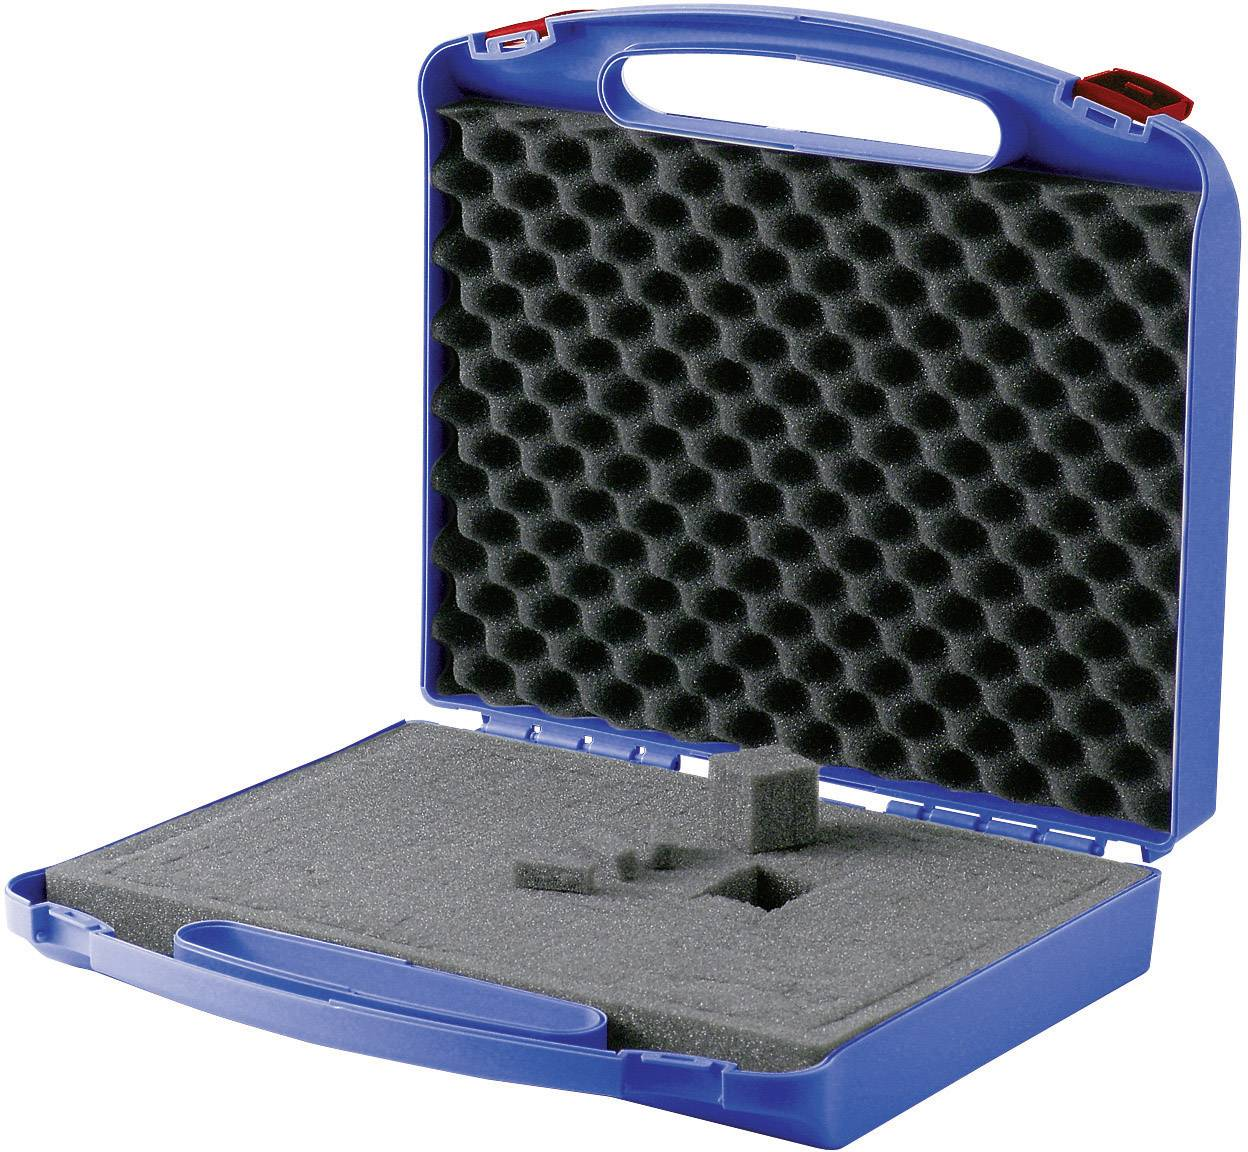 Kufrík na náradie 821406, (š x v x h) 340 x 310 x 80 mm